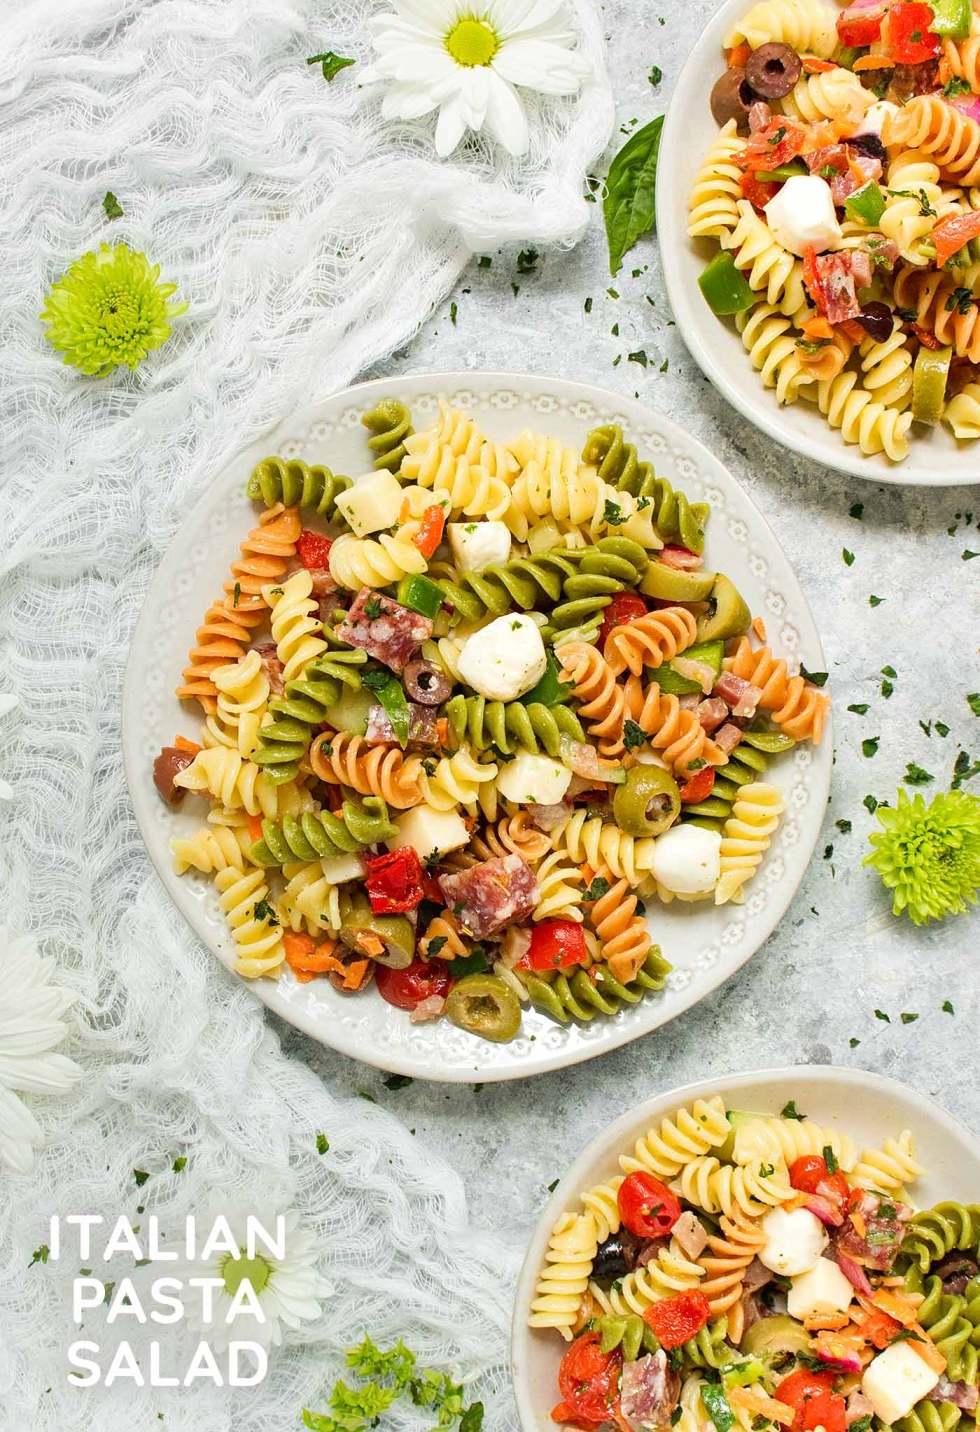 Italian Pasta Salad - Recipe at SoupAddict.com